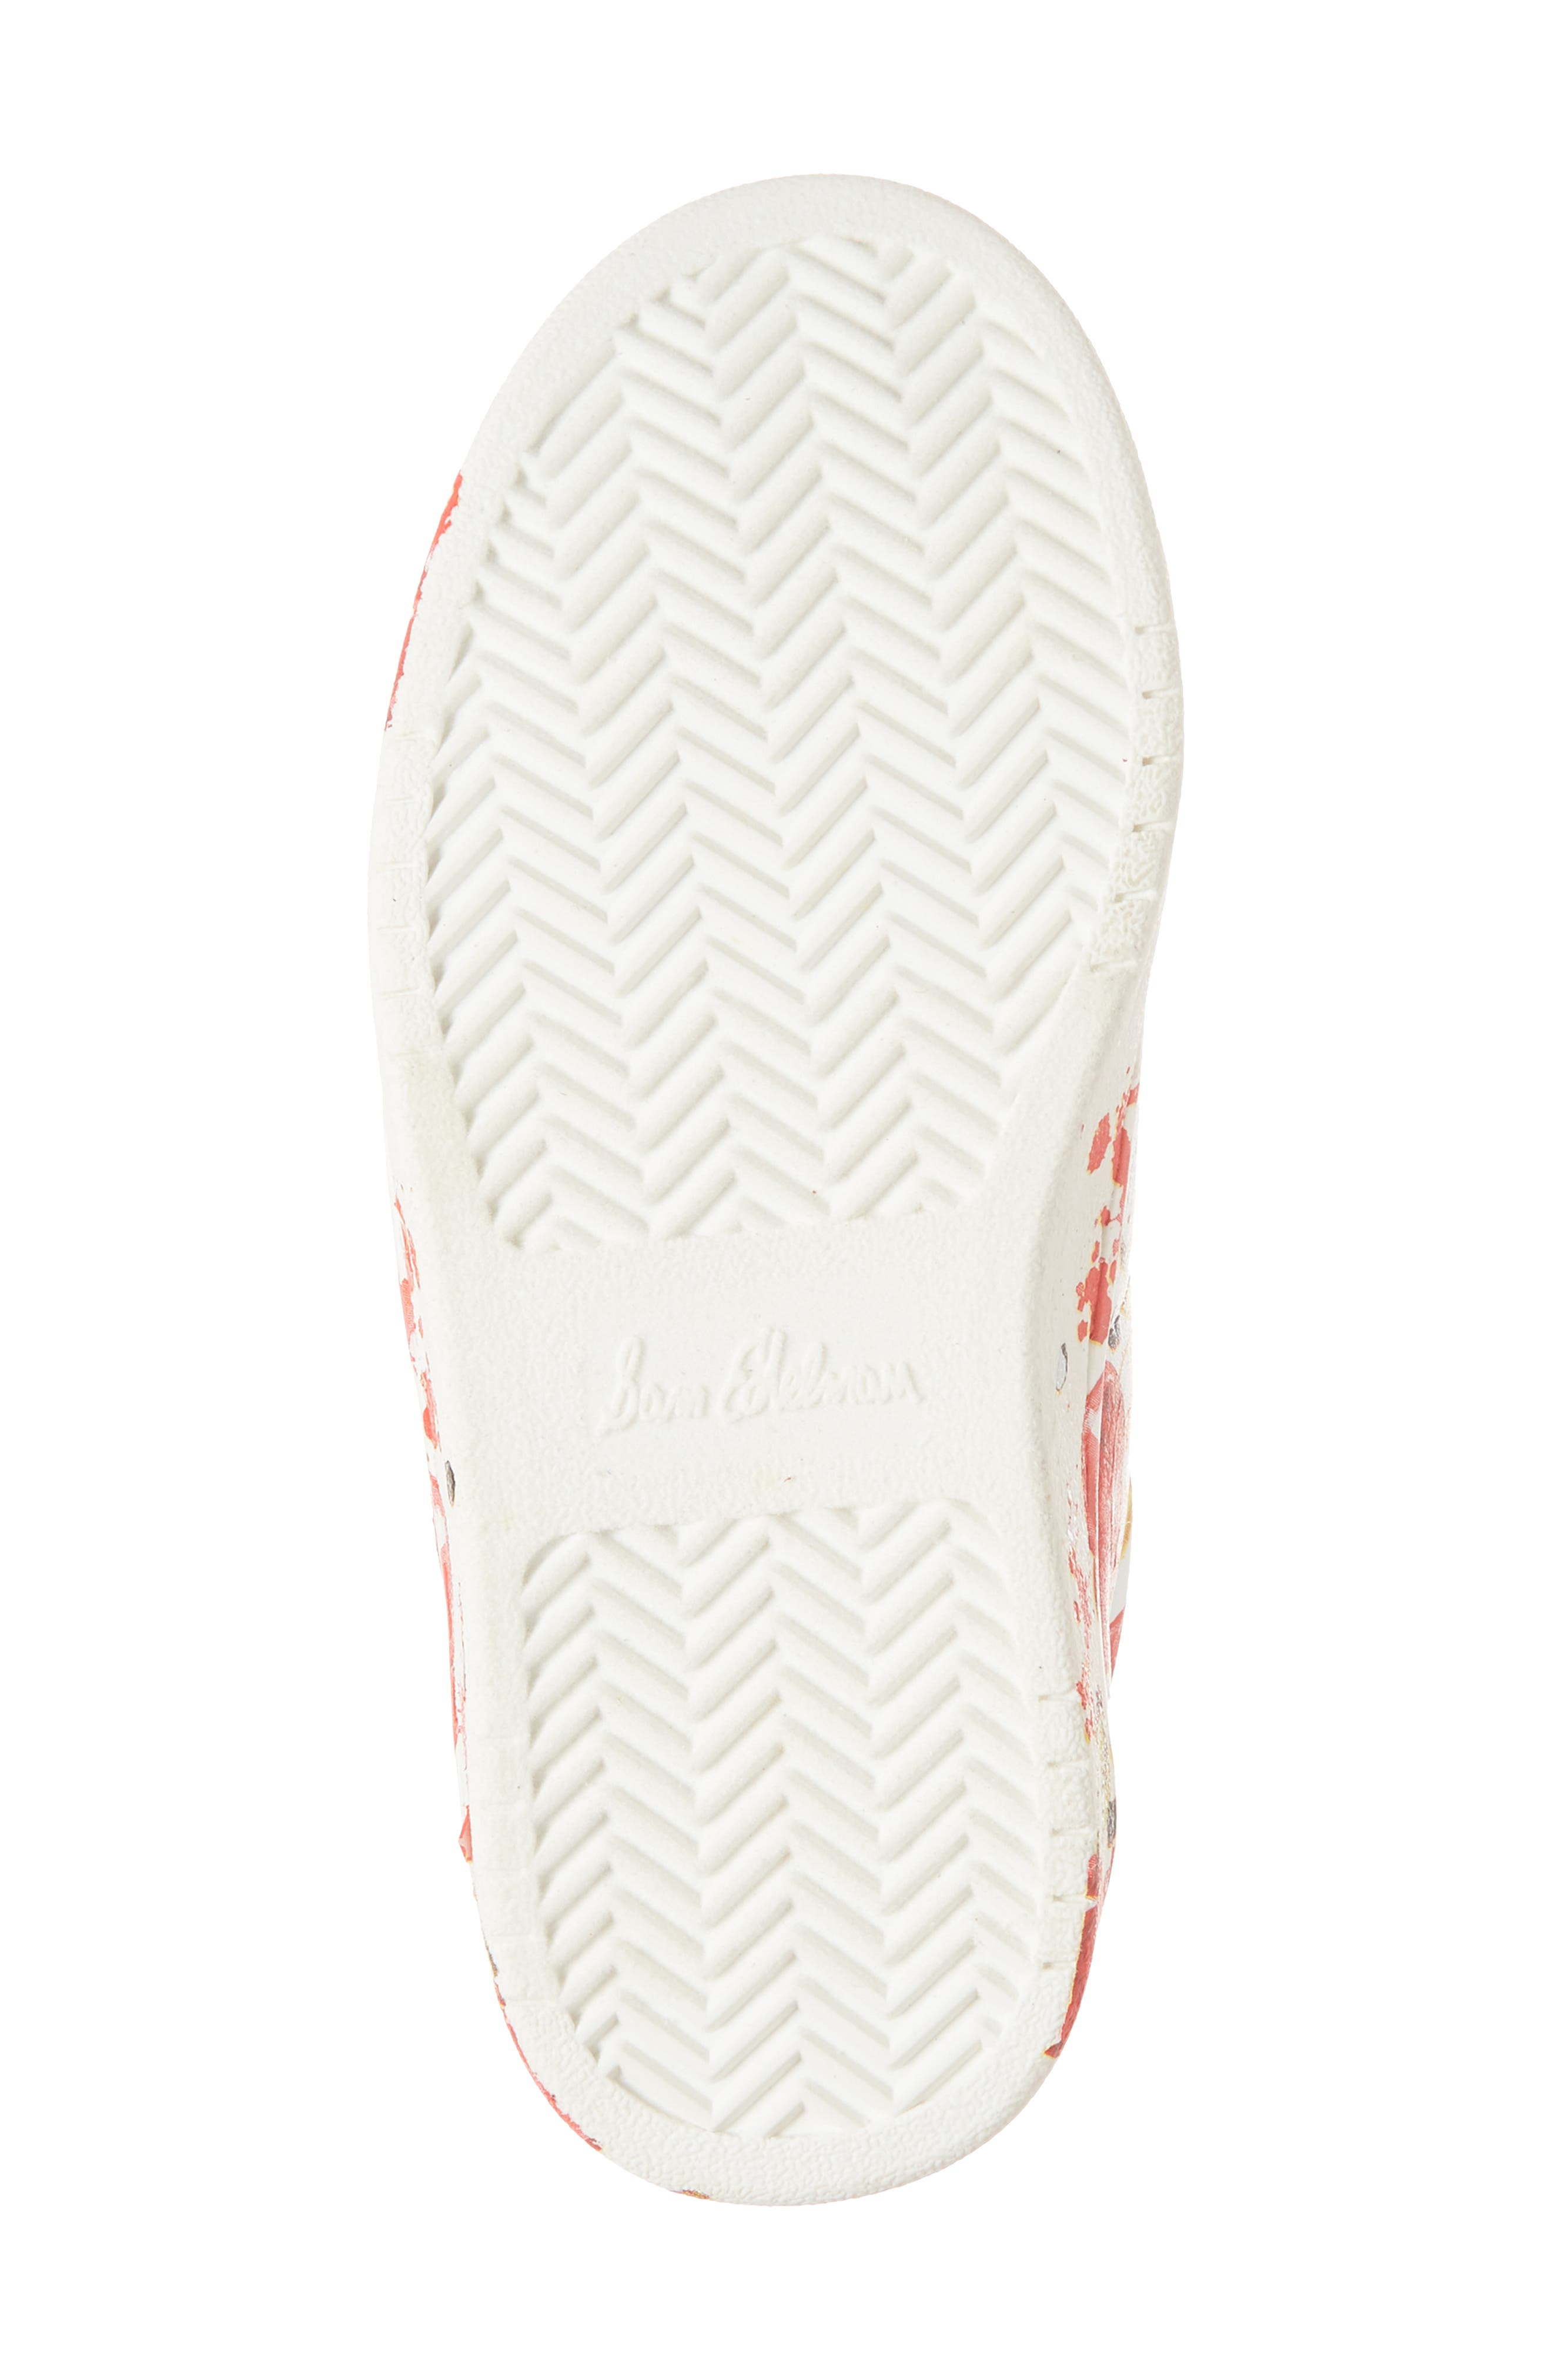 Blane Milford Fruit Print Sneaker,                             Alternate thumbnail 6, color,                             100